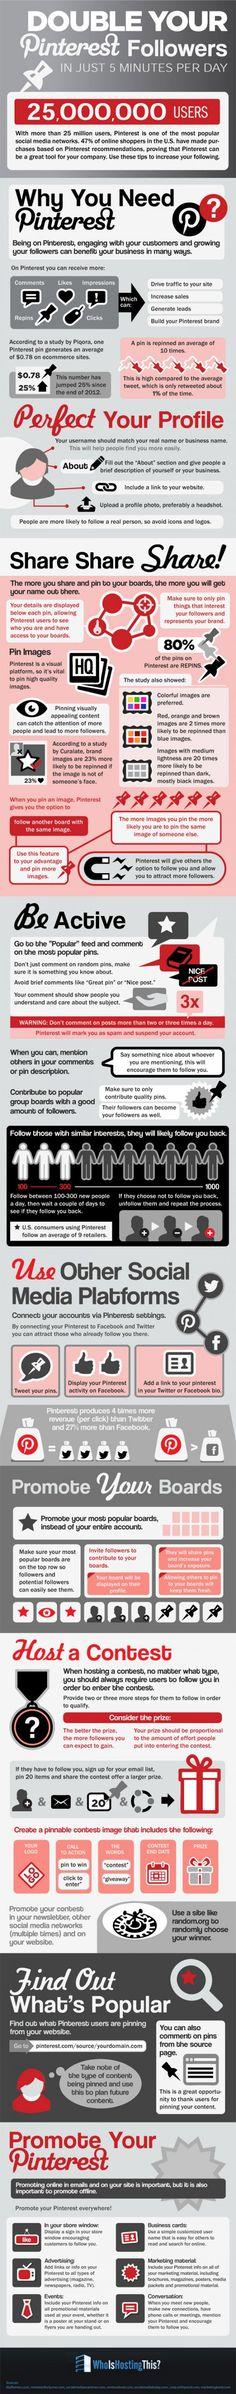 Double your #Pinterest Followers! #Marketing #Business #Entrepreneur #Startup #Ecommerce #Content